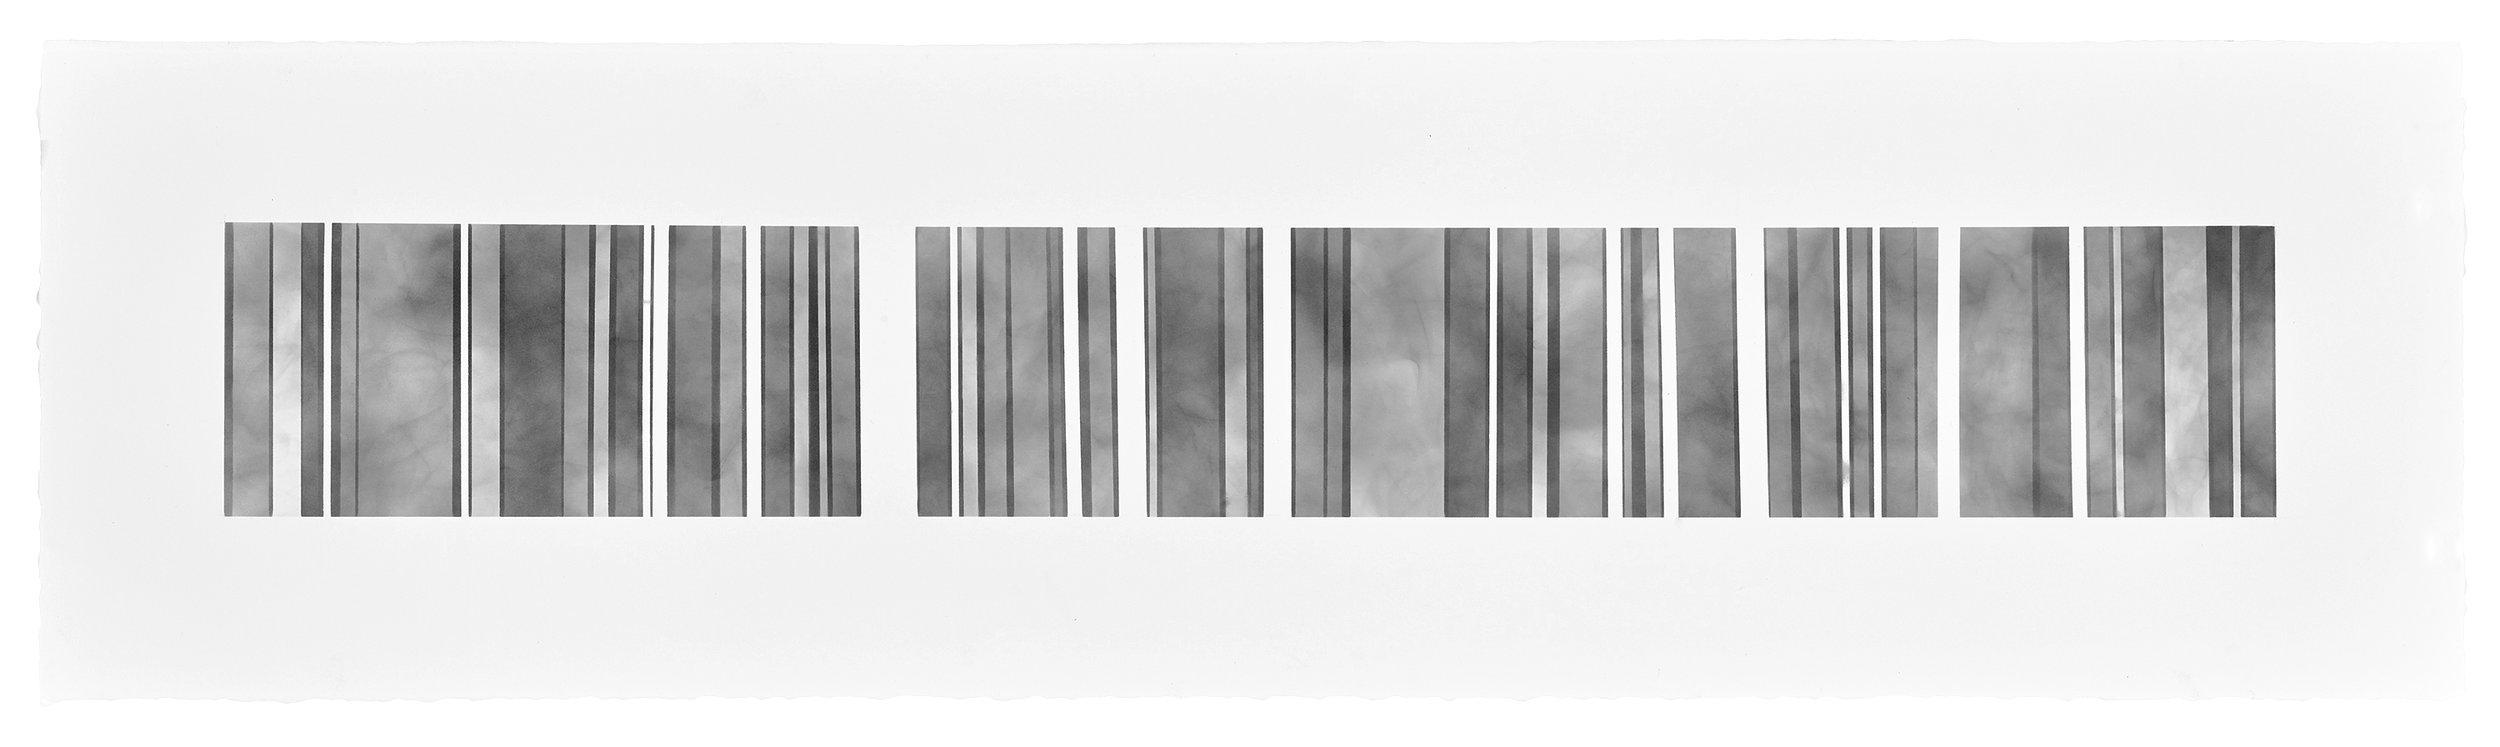 Barcode Series D 3, 2018 copy.jpg